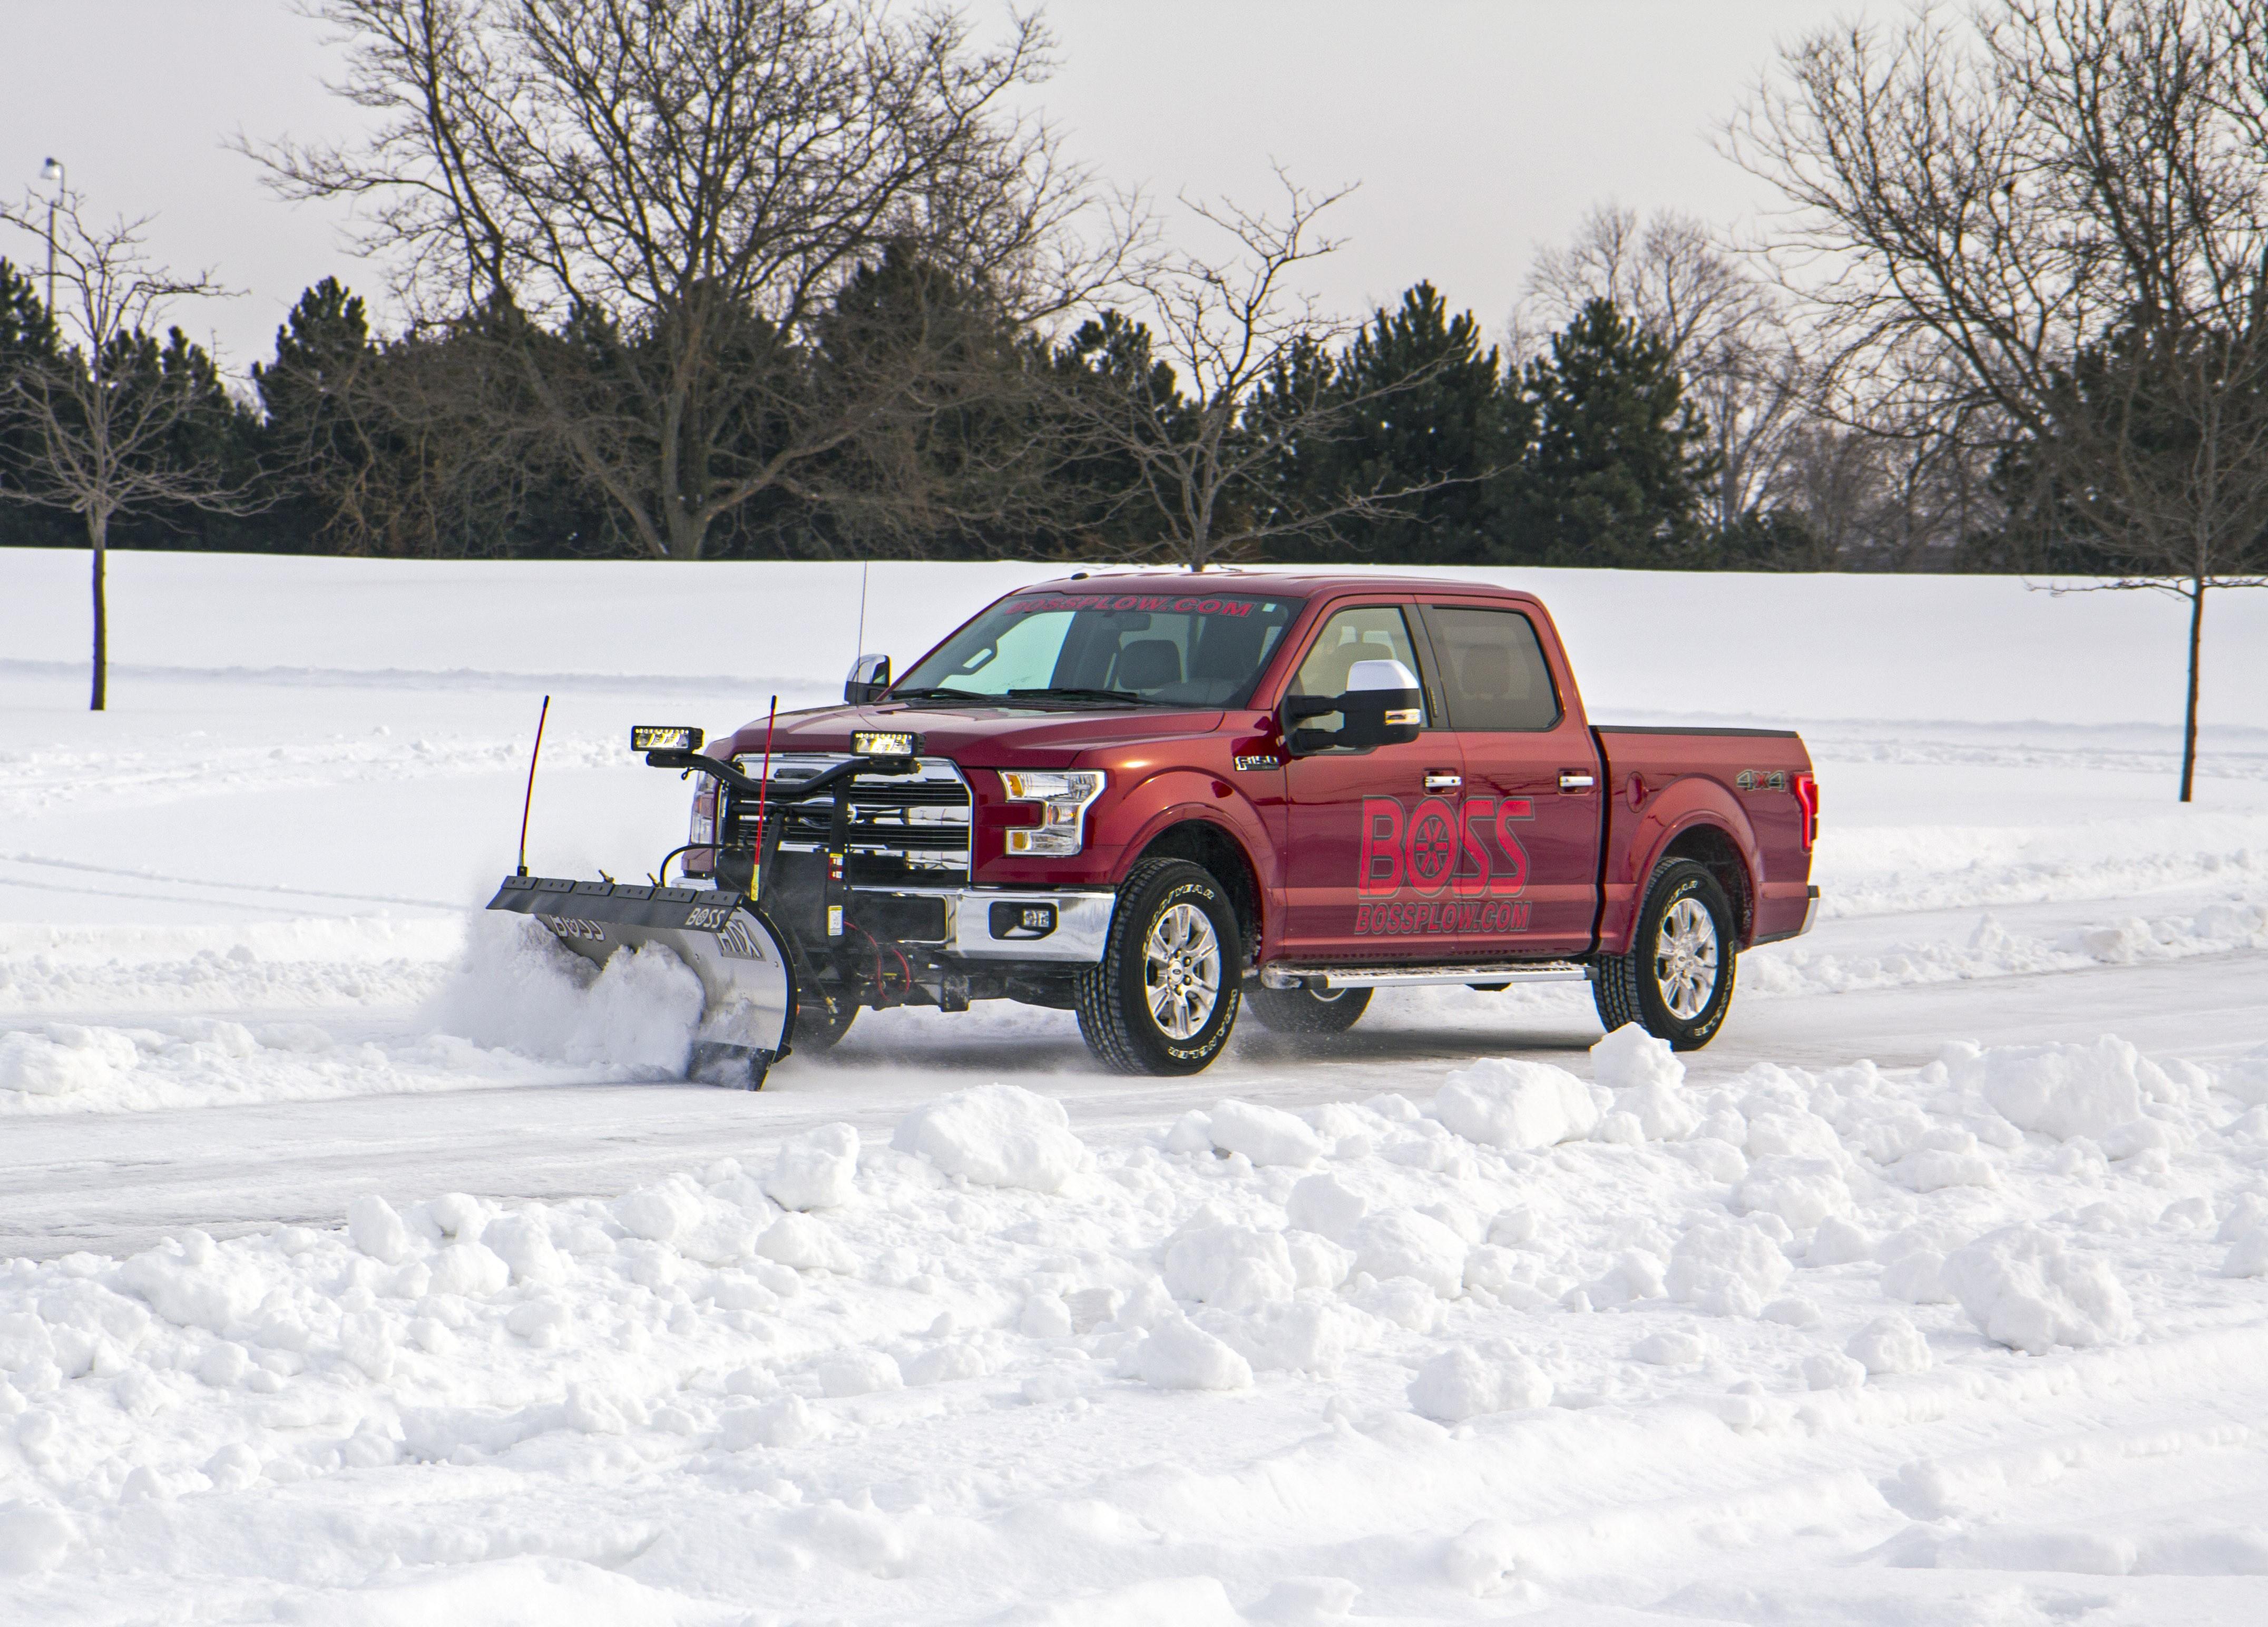 2015 Ford F 150 Snow Plow Option Costs 50 Bucks Sans The